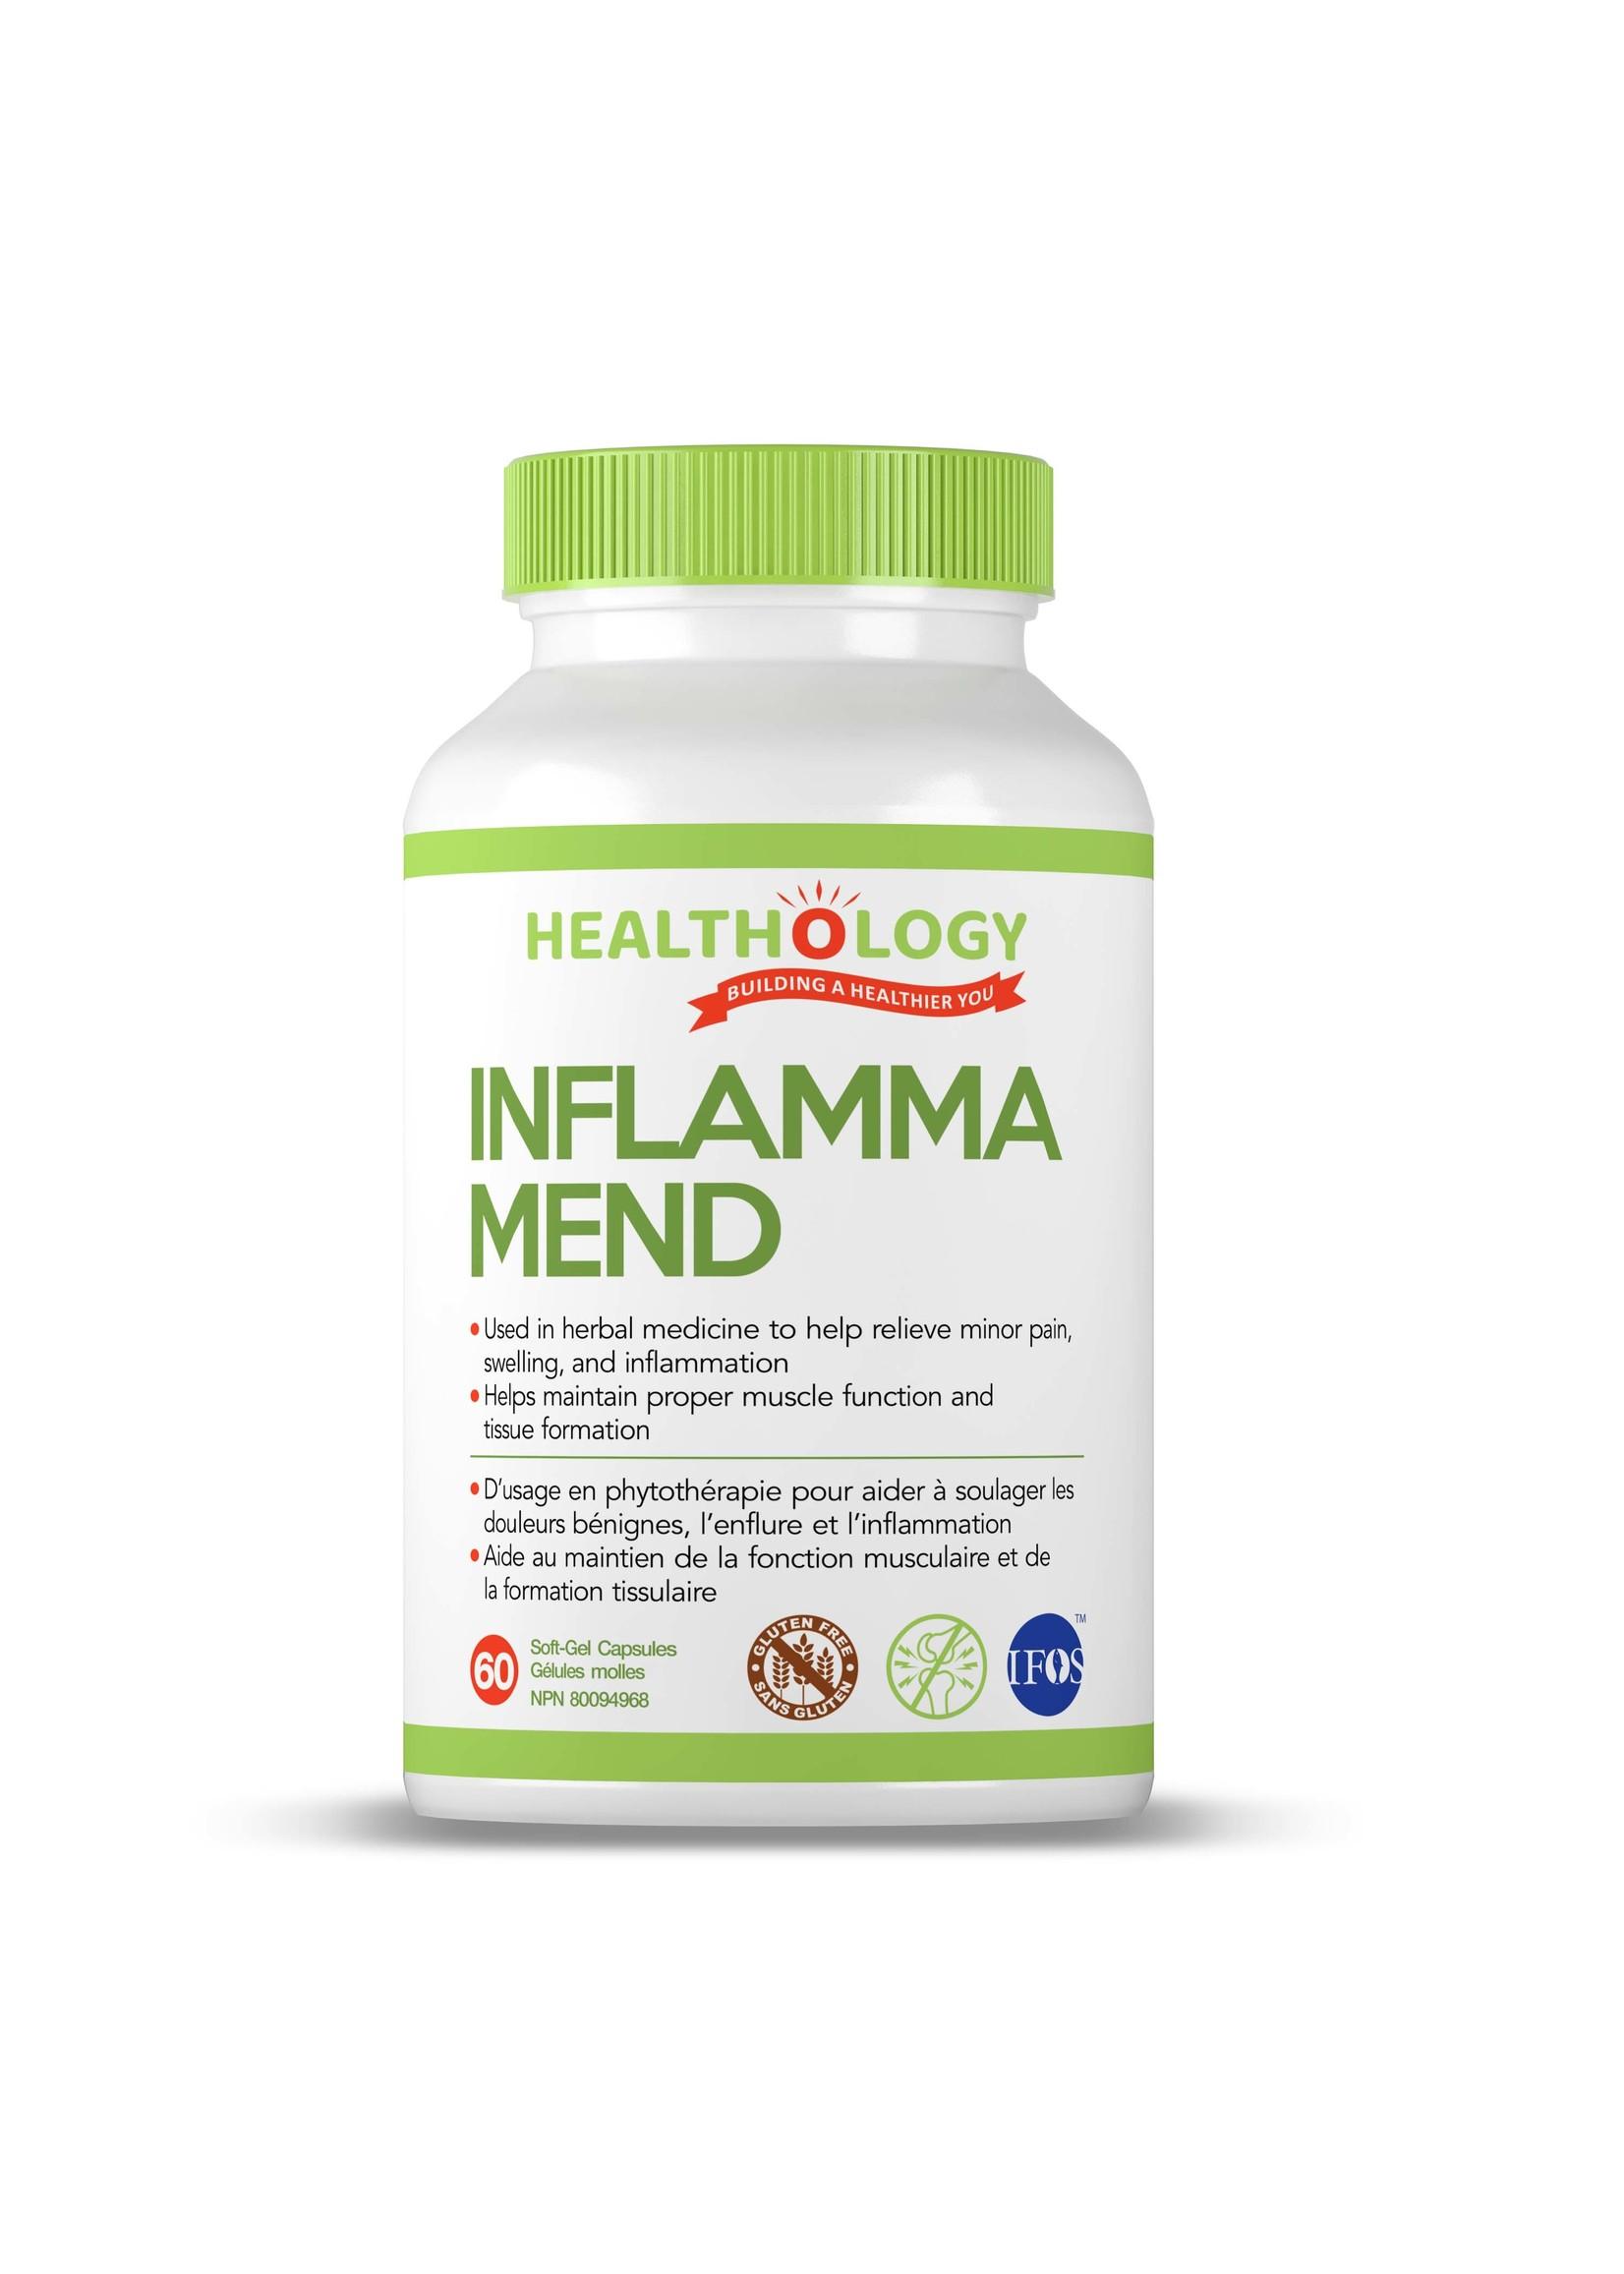 Healthology Healthology INFLAMMA-MEND 60 Soft-Gel Capsules